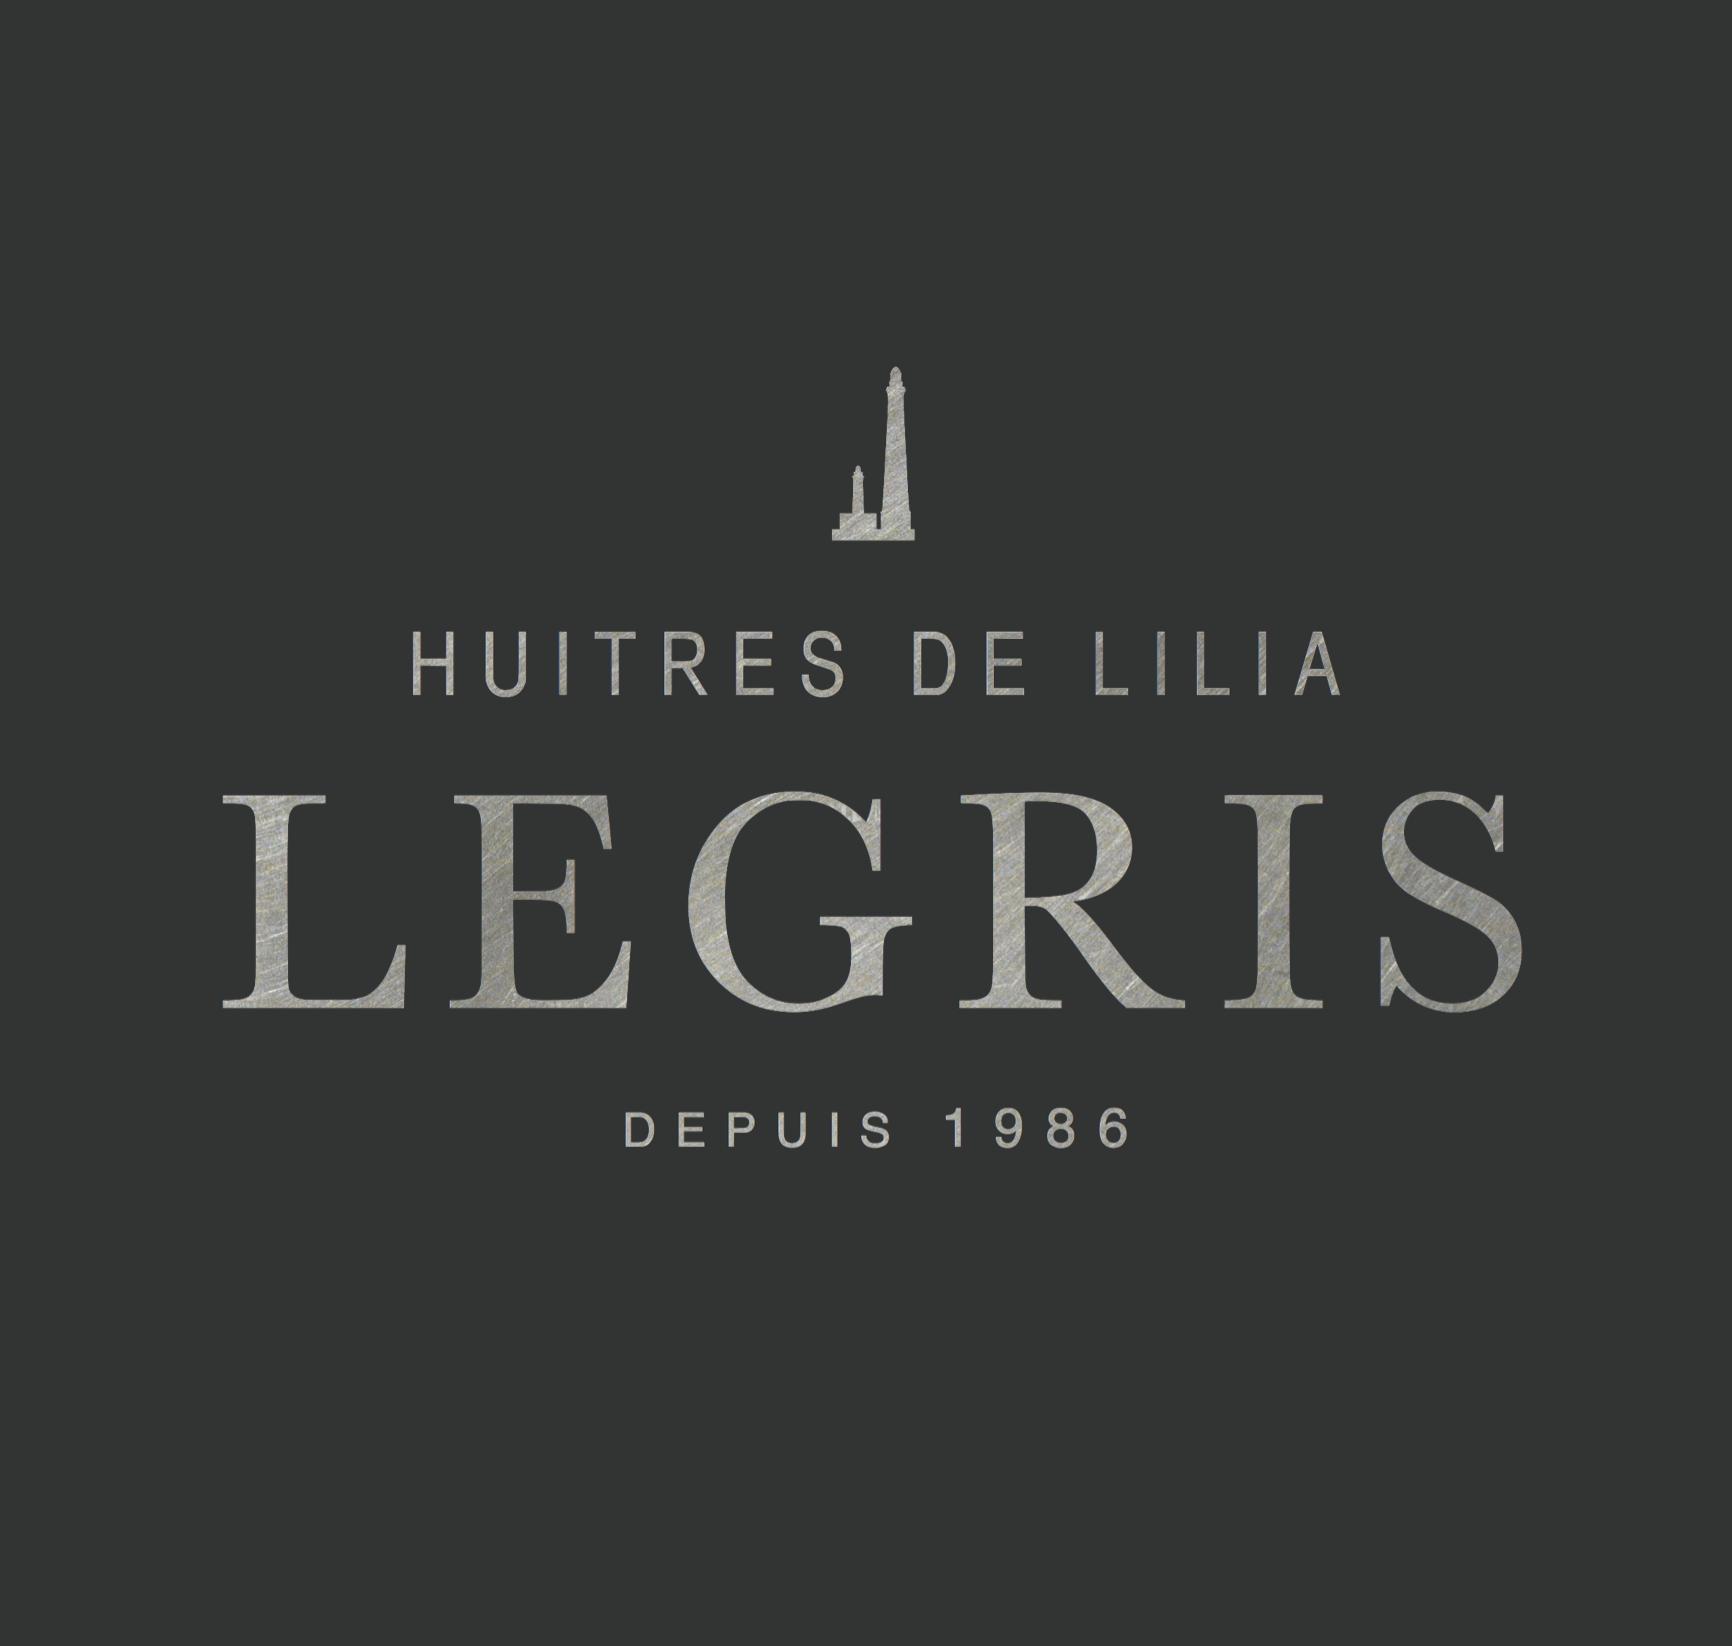 Adhérent HUÎTRES LEGRIS - photo #7033